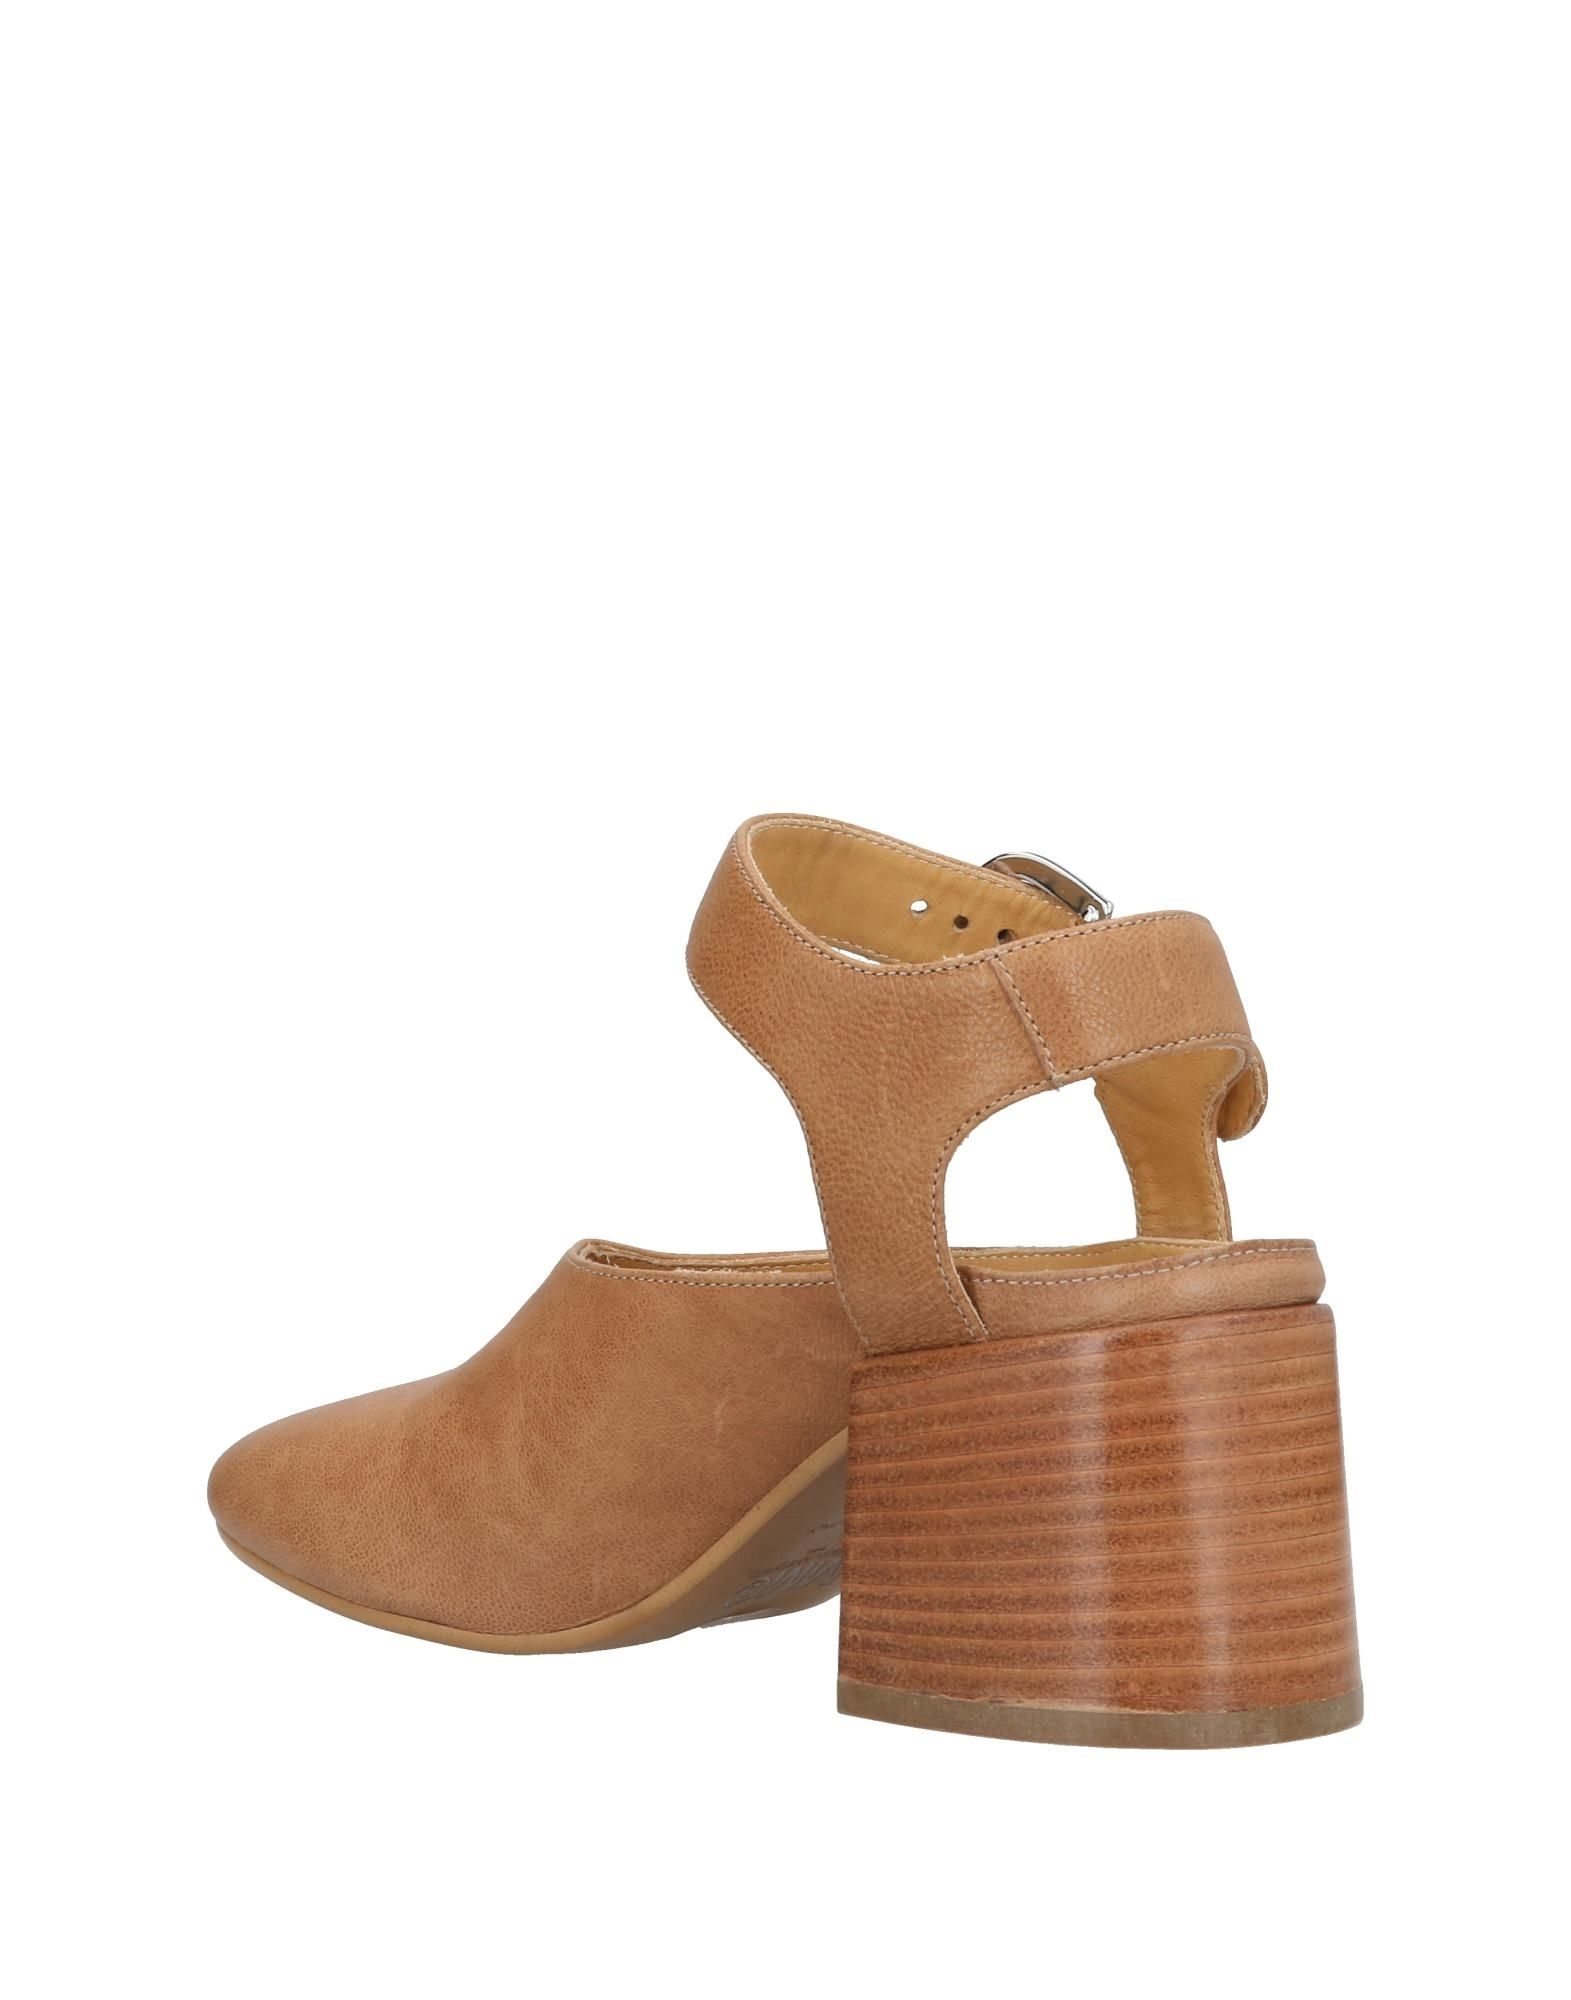 Mm6 Damen Maison Margiela Sandalen Damen Mm6  11427388WN Neue Schuhe b957b8